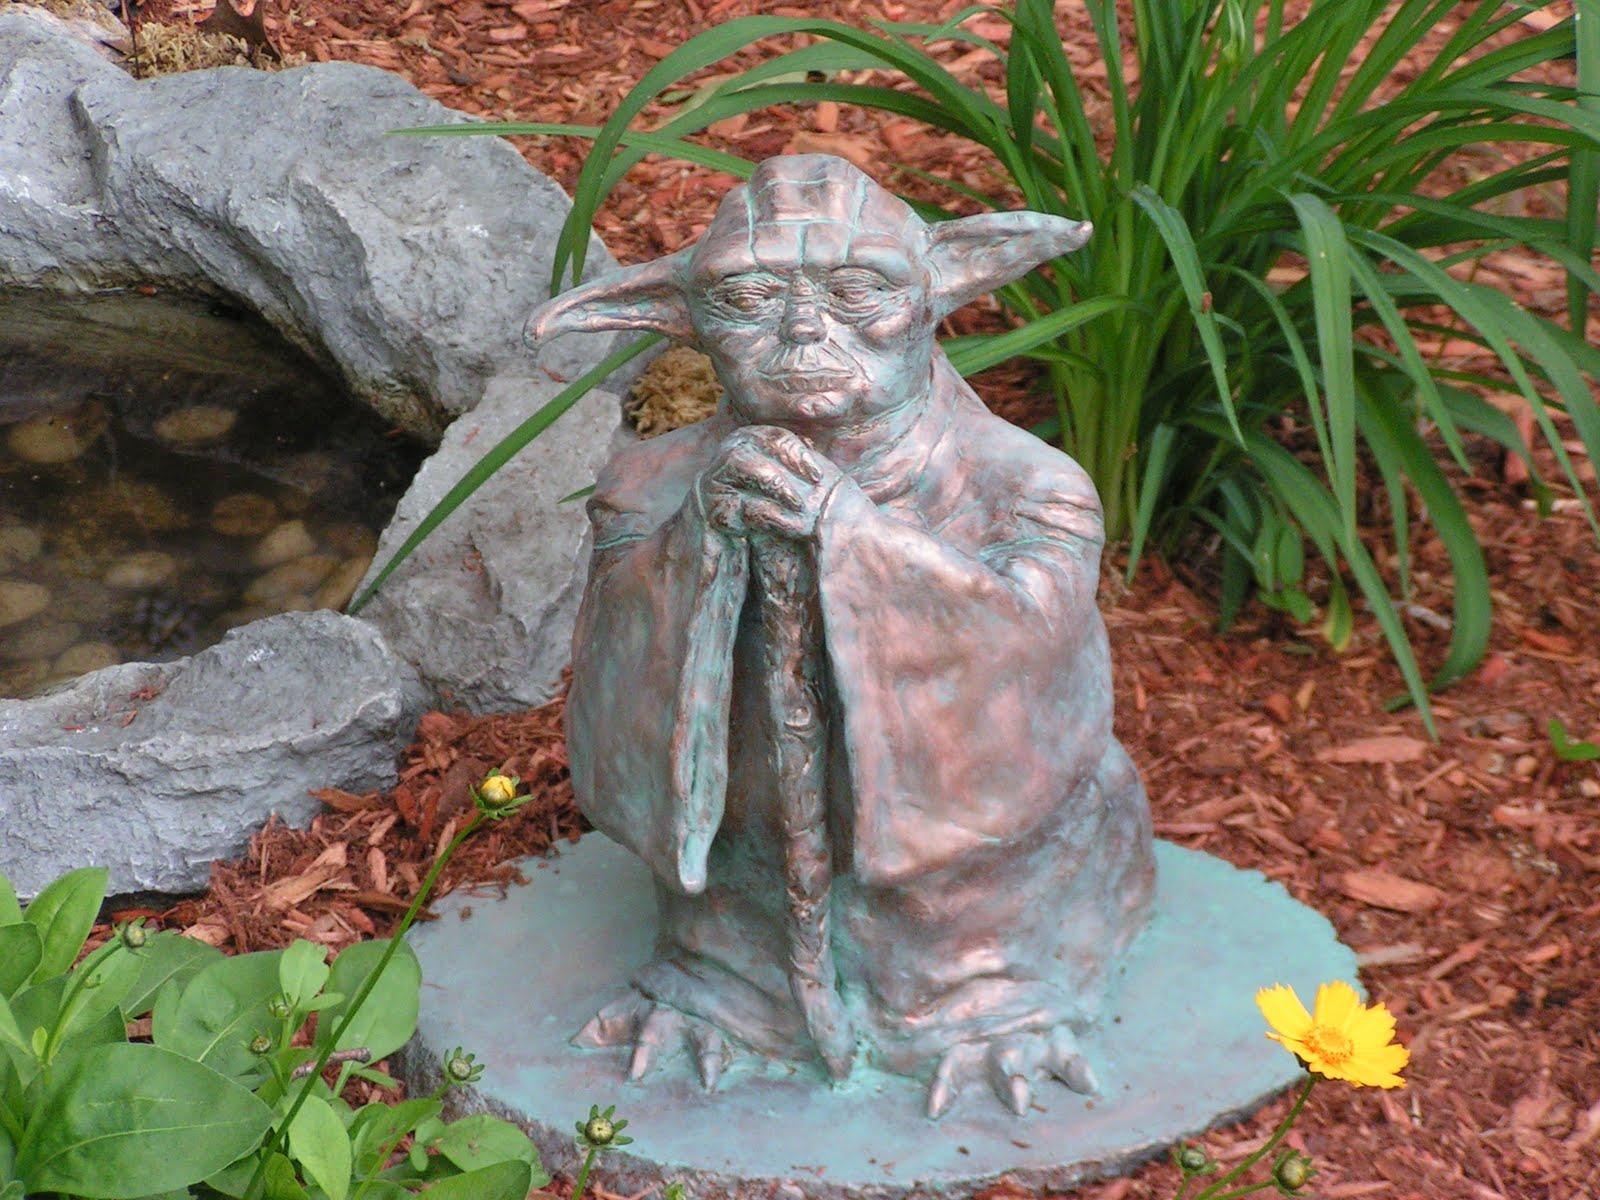 Whoops I think I broke it...: Project Yoda Garden Statue